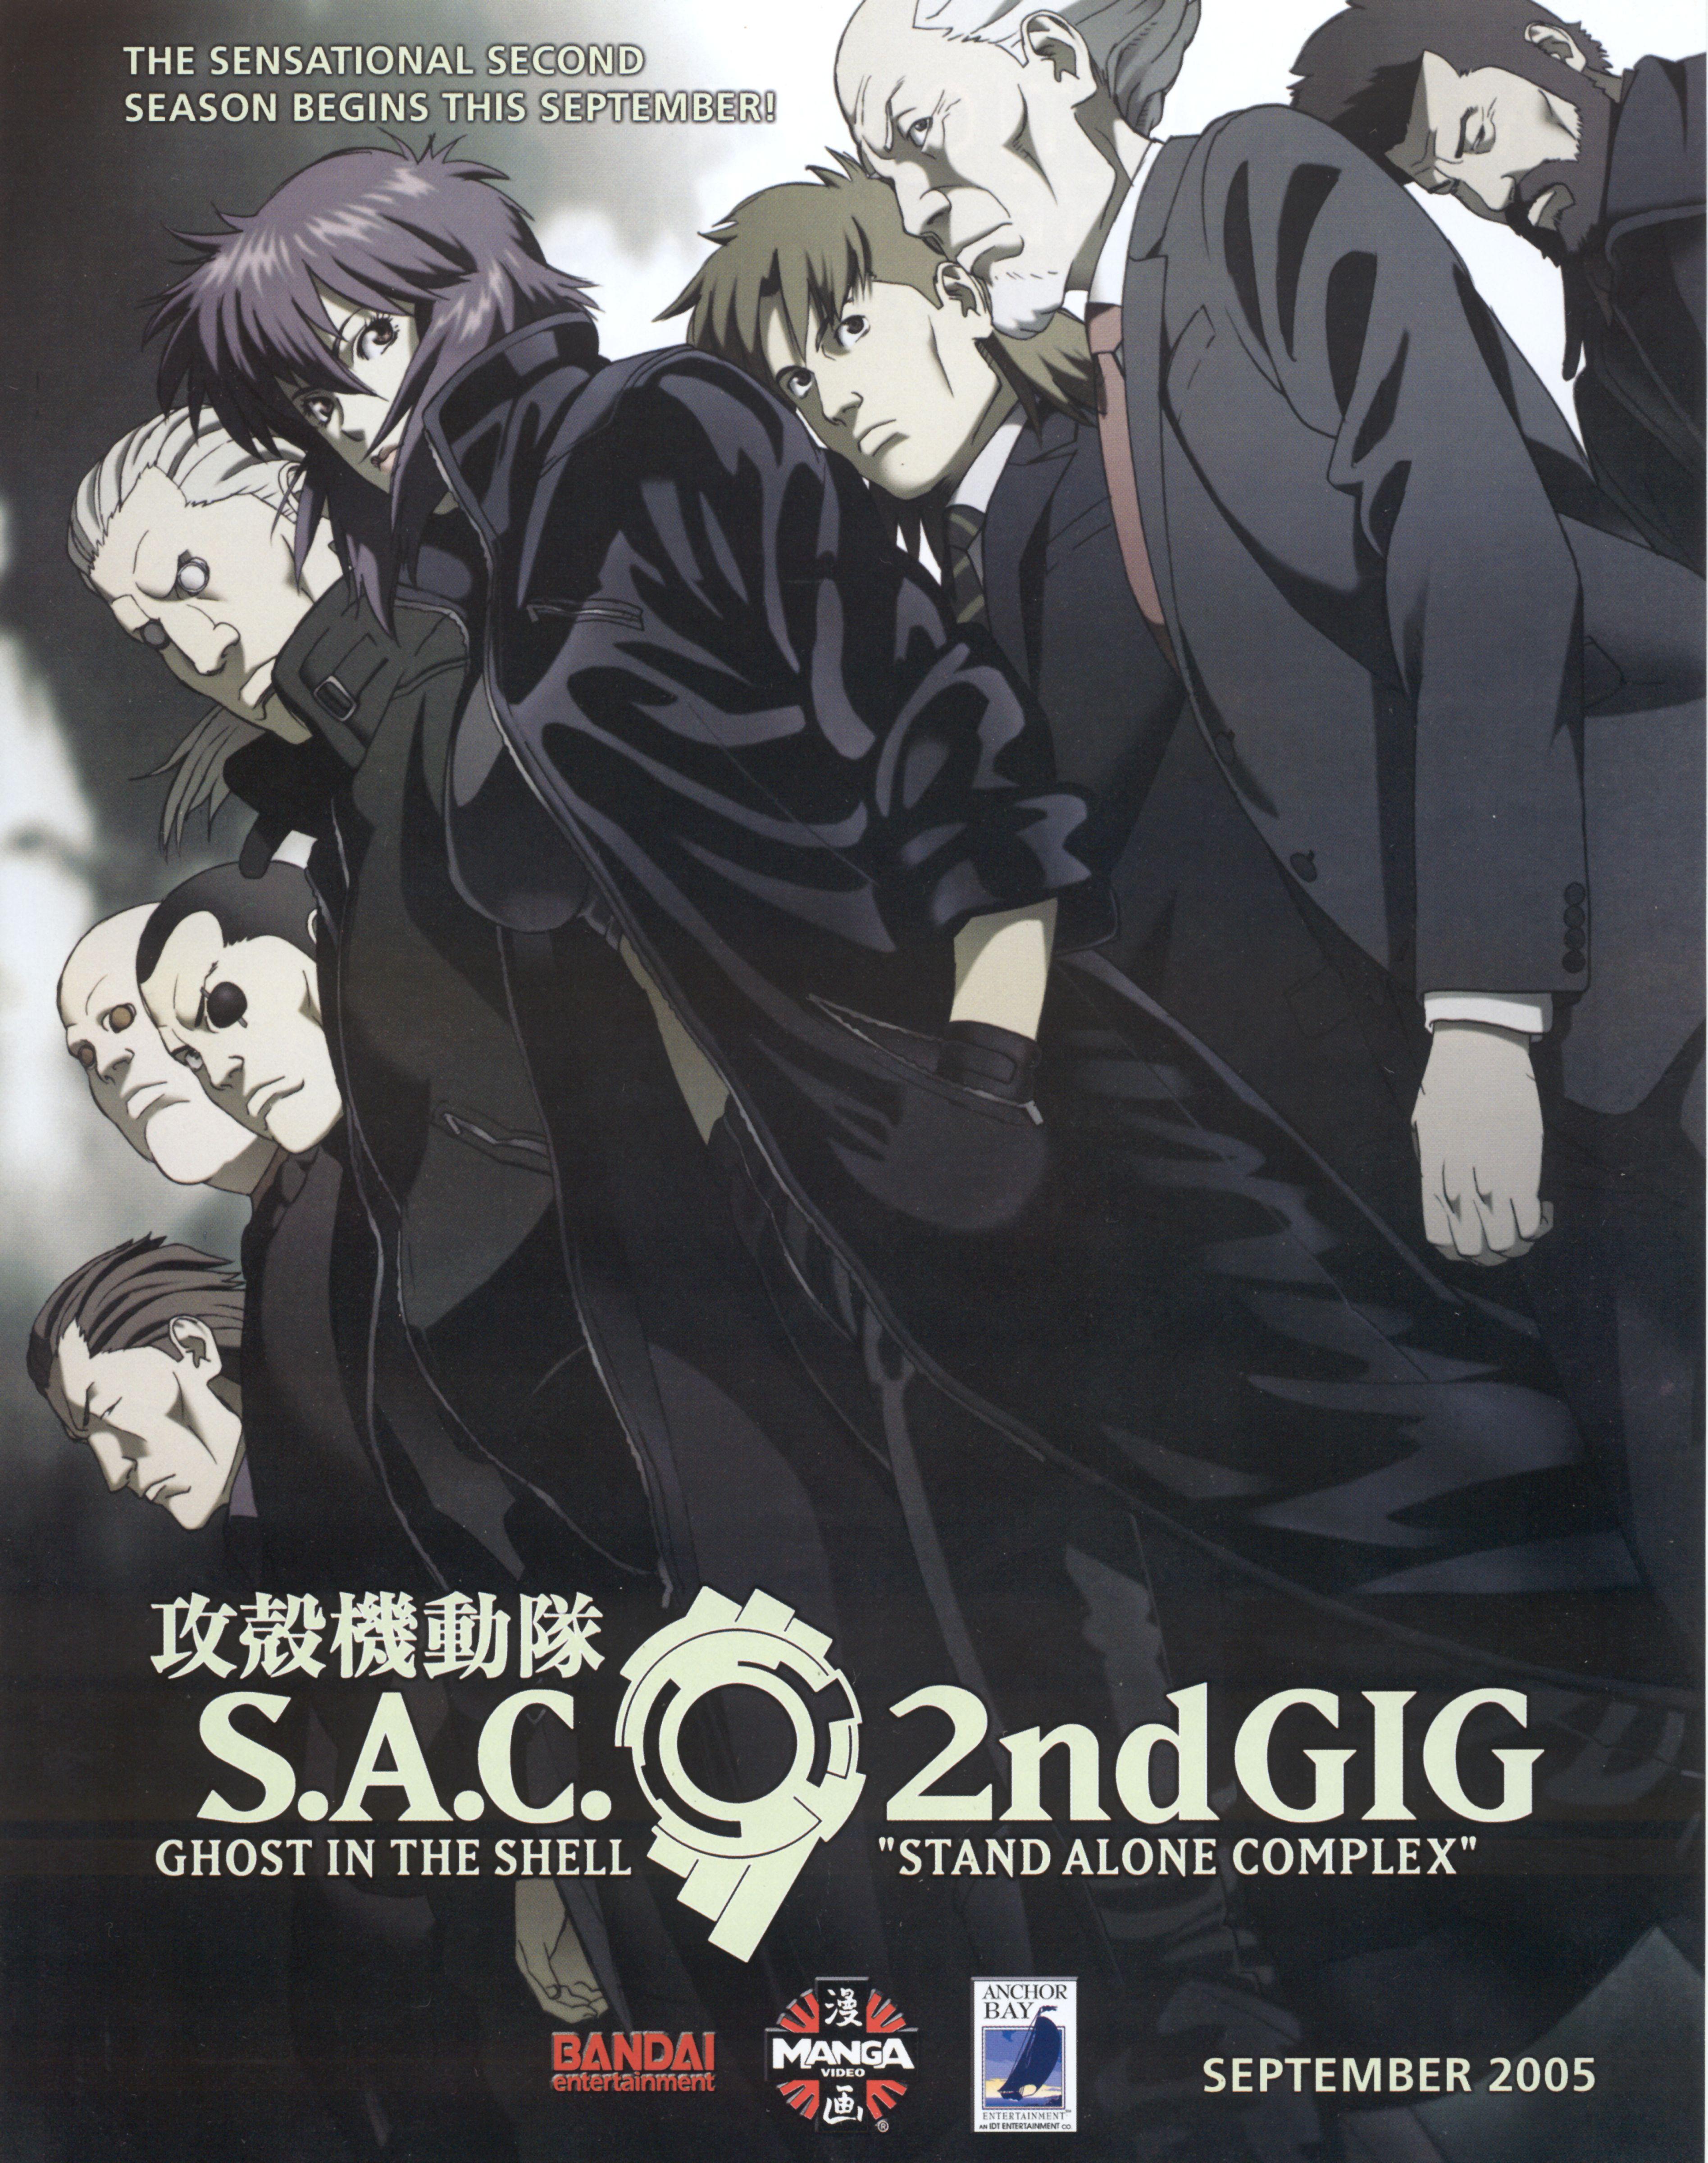 masamune-shirow-ghost-in-the-shell-anime-manga-filme-cinema-dionisio-arte-6